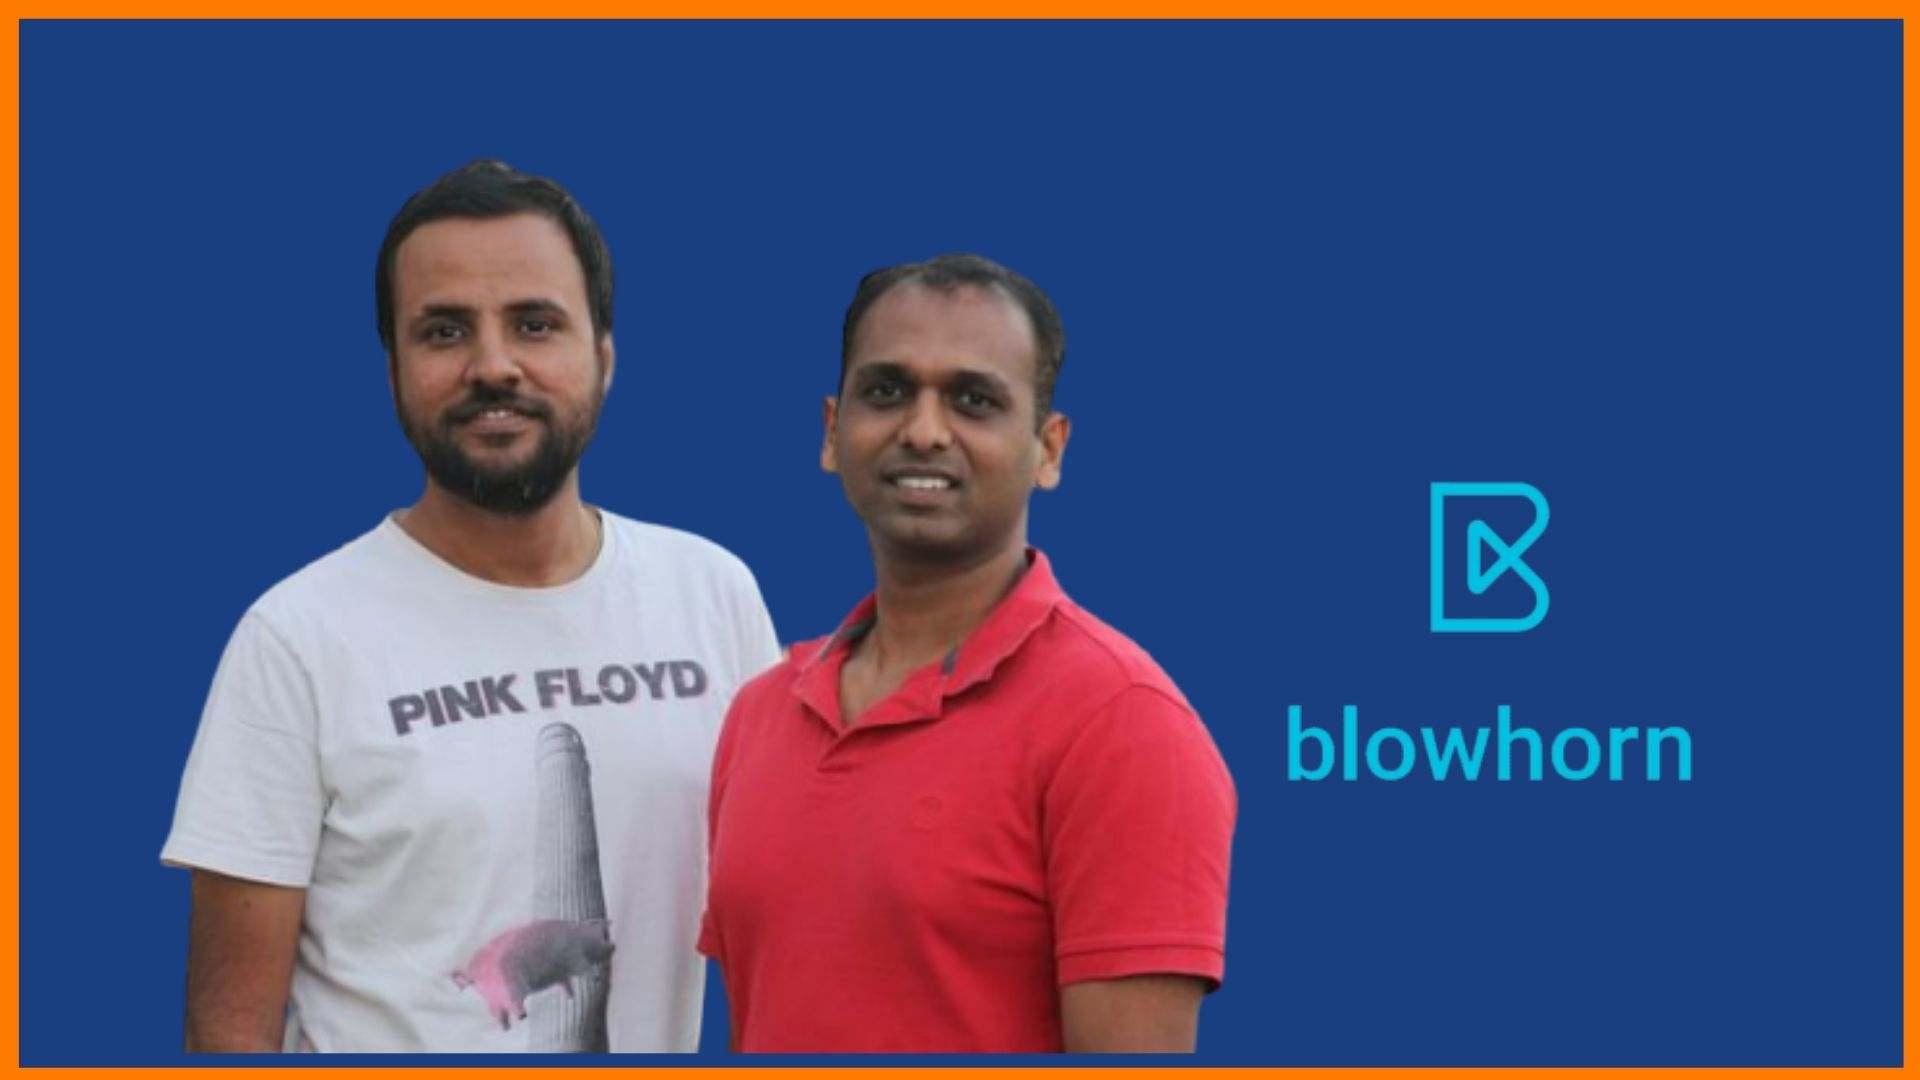 Founders of Blowhorn - Mithun Srivatsa and Nikhil Shivaprasad